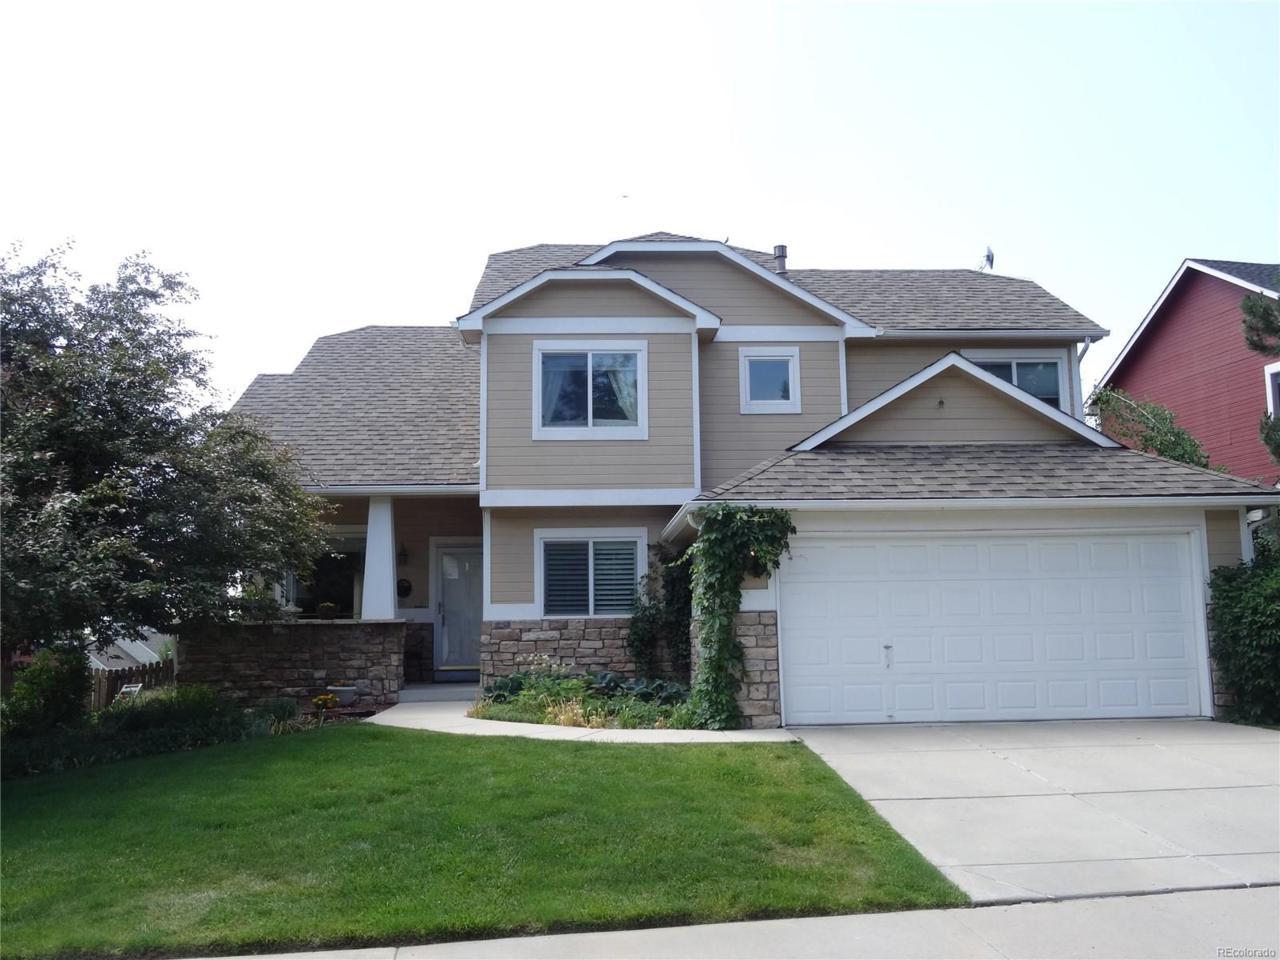 722 Nighthawk Circle, Louisville, CO 80027 (MLS #2801071) :: 8z Real Estate